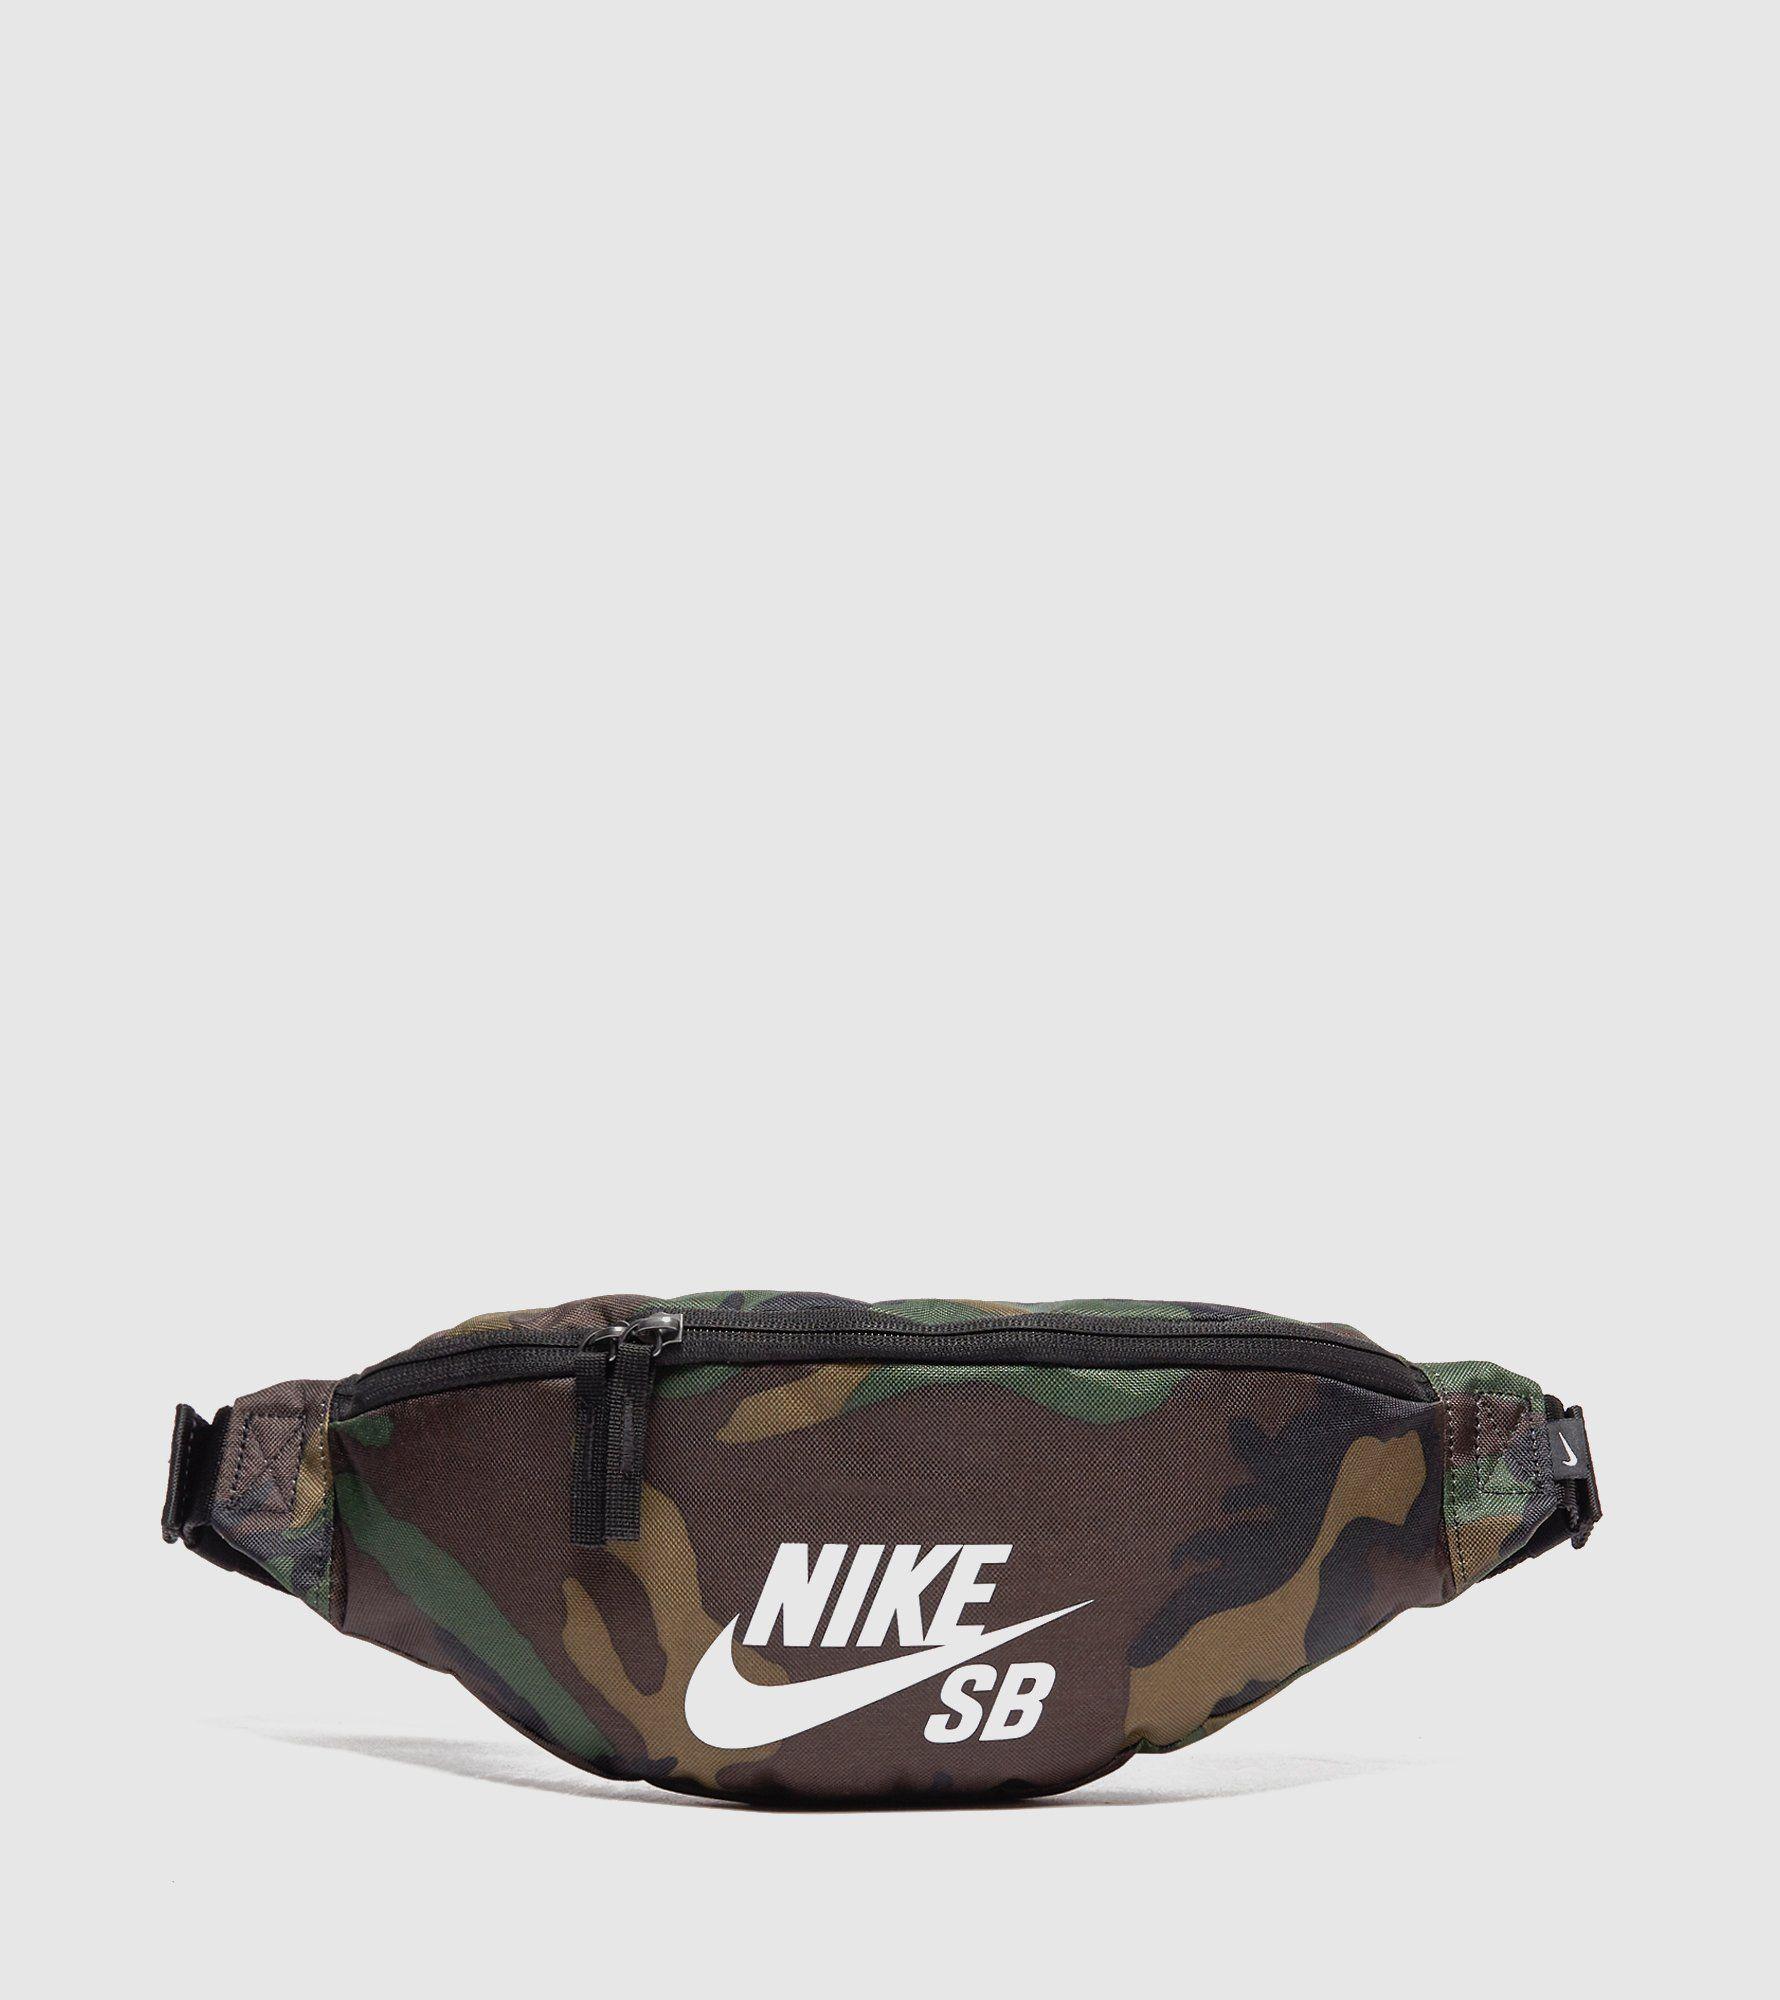 Nike SB Heritage Waist Bag